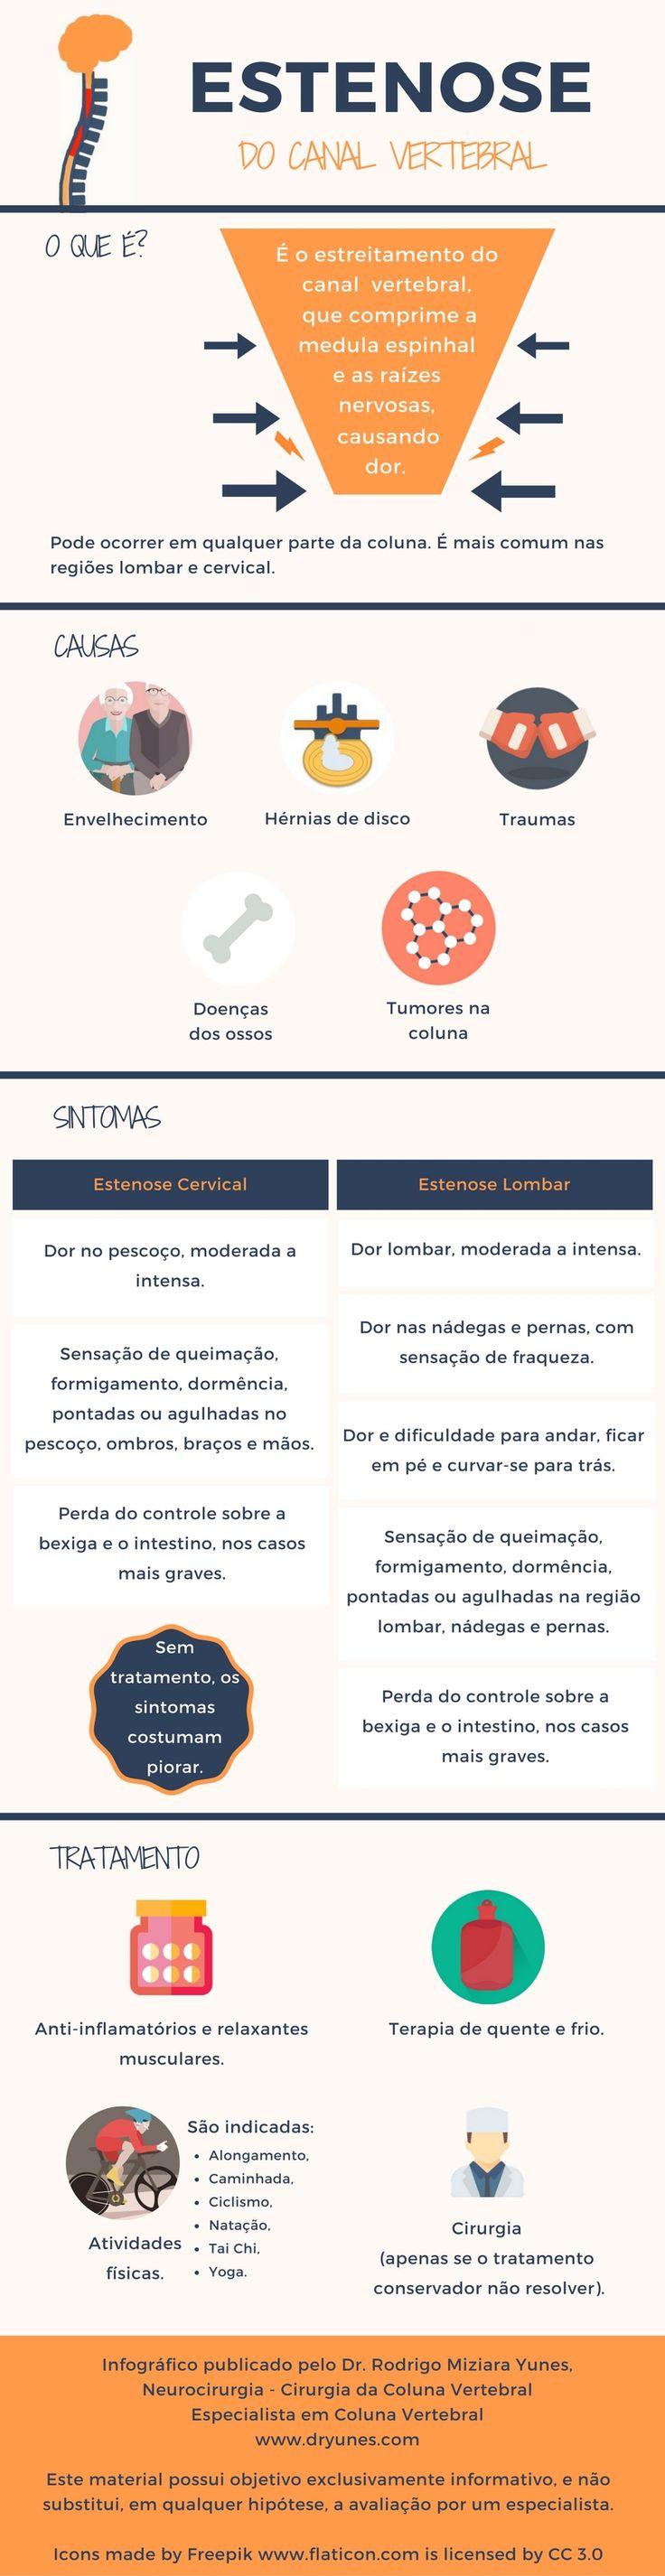 Estenose de canal vertebral - Dr. Rodrigo Yunes